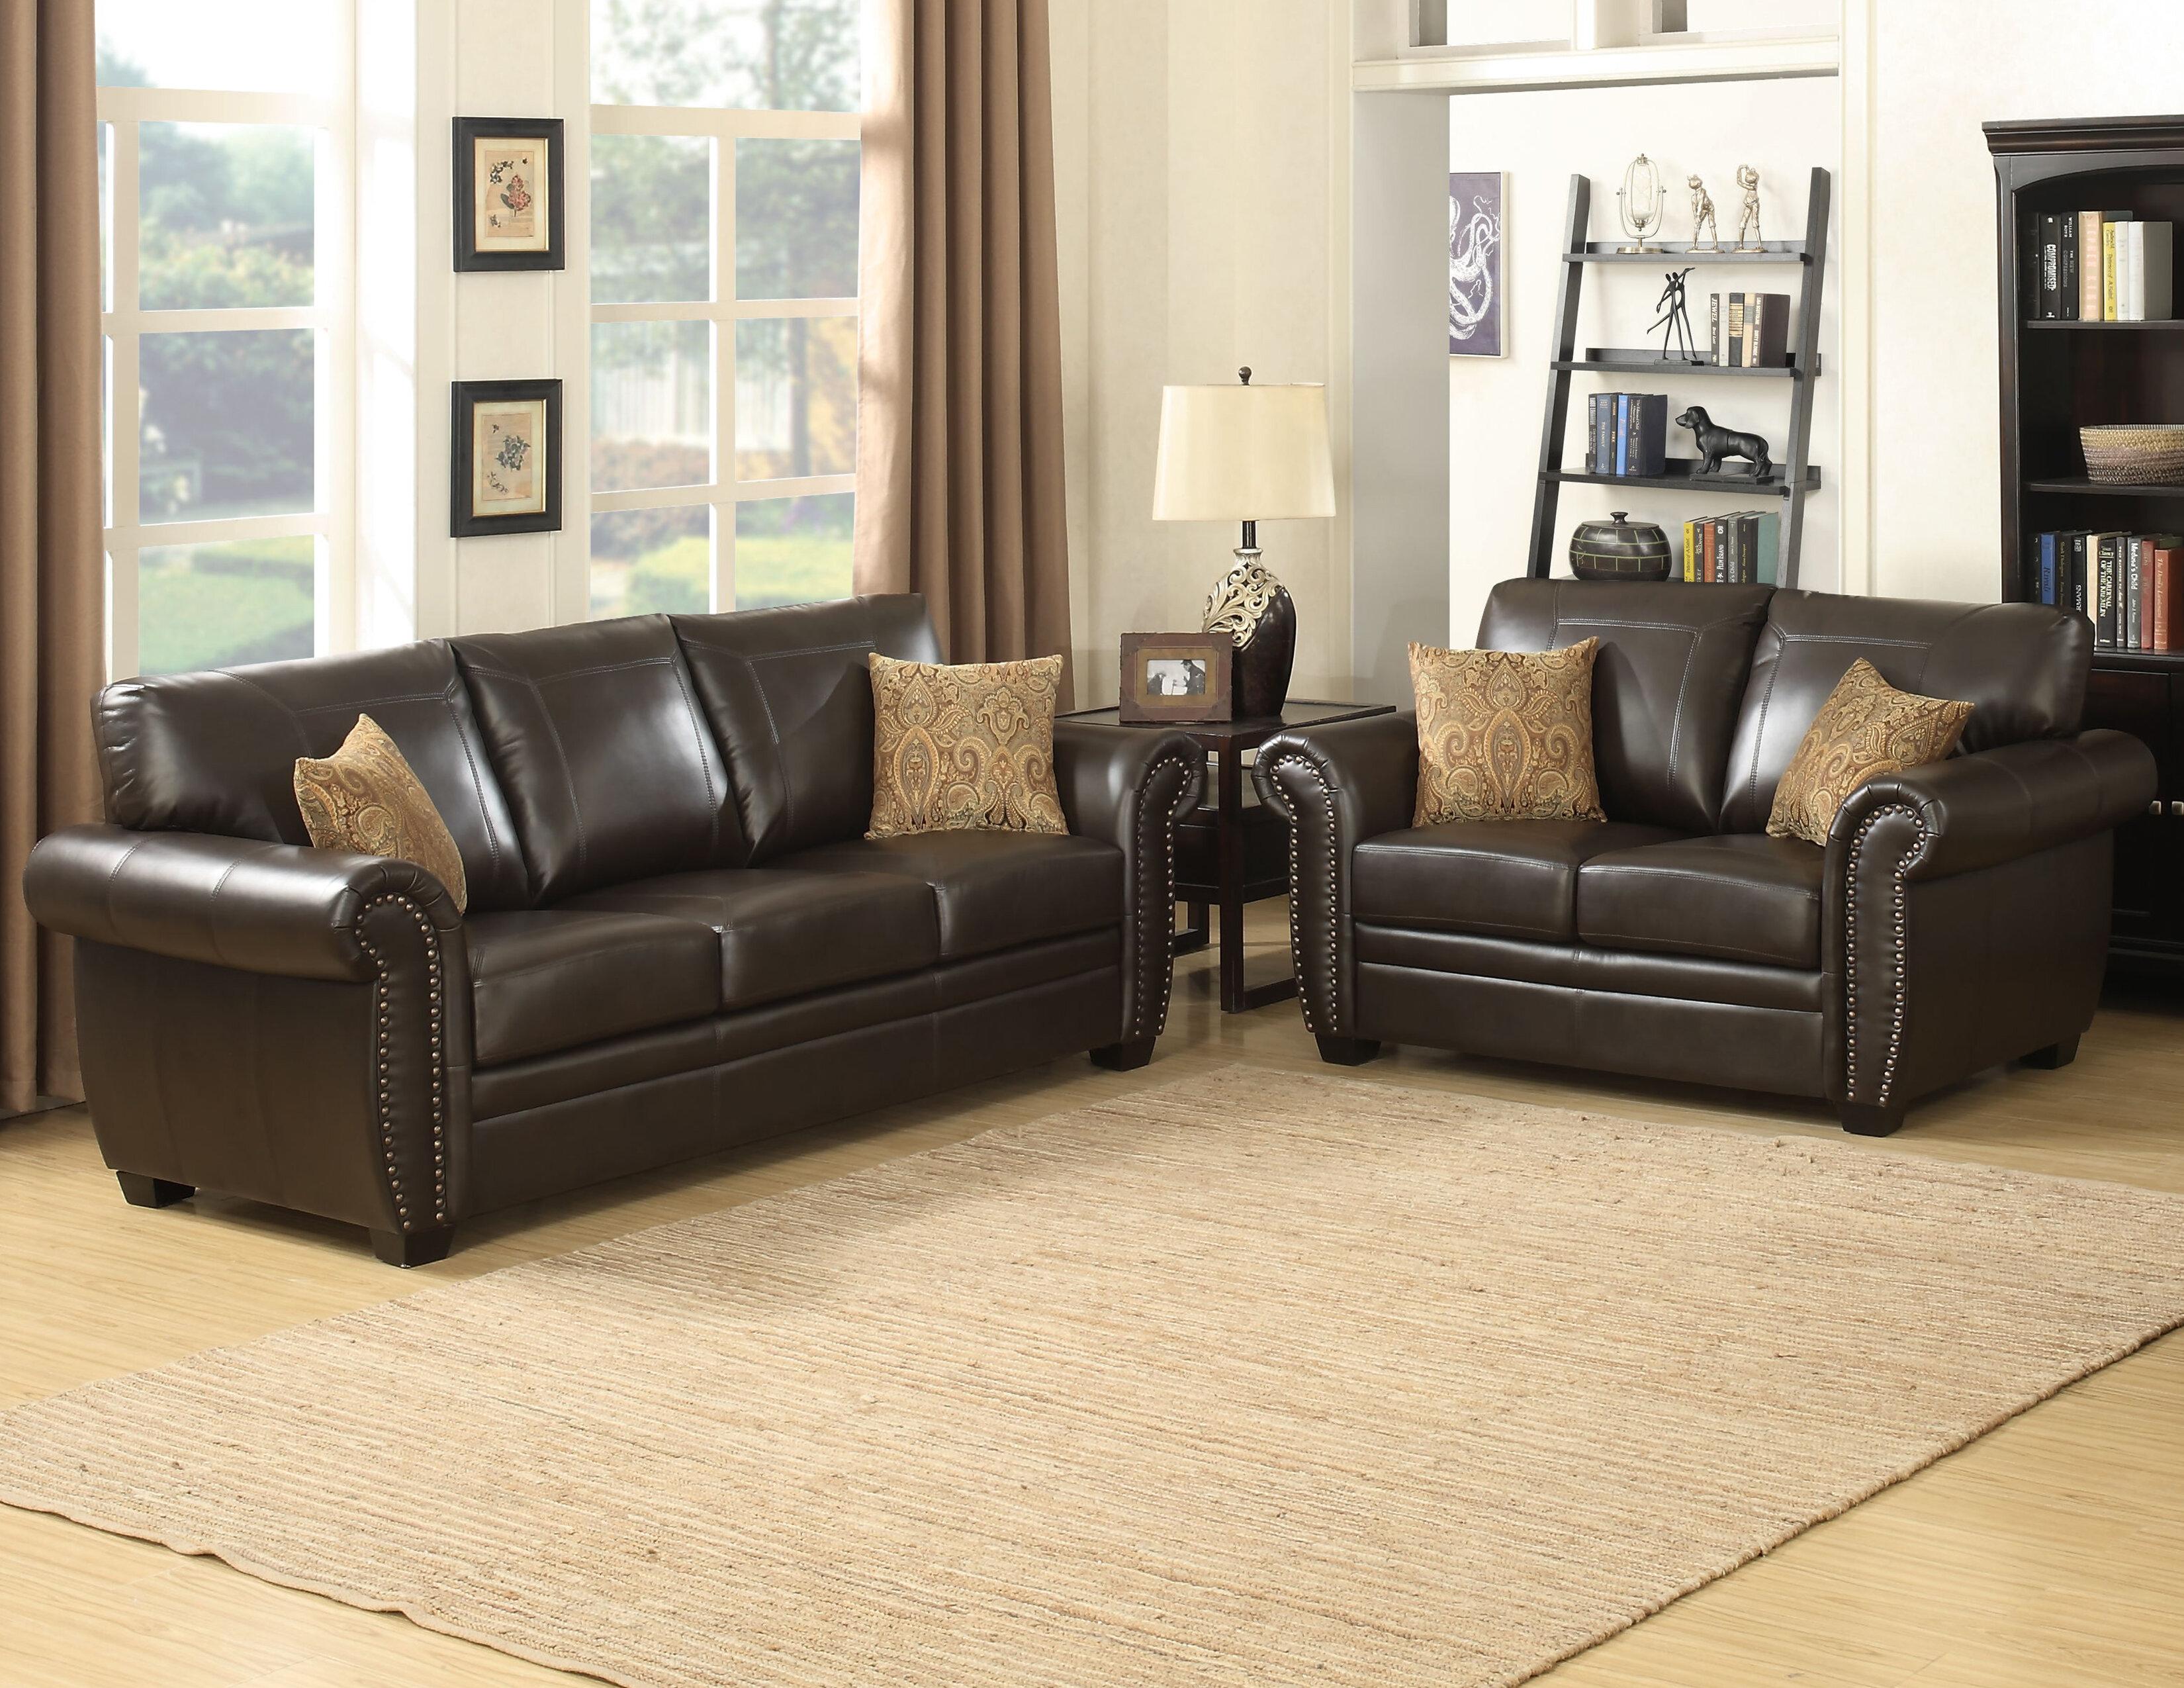 Ac pacific louis 2 piece living room set reviews wayfair